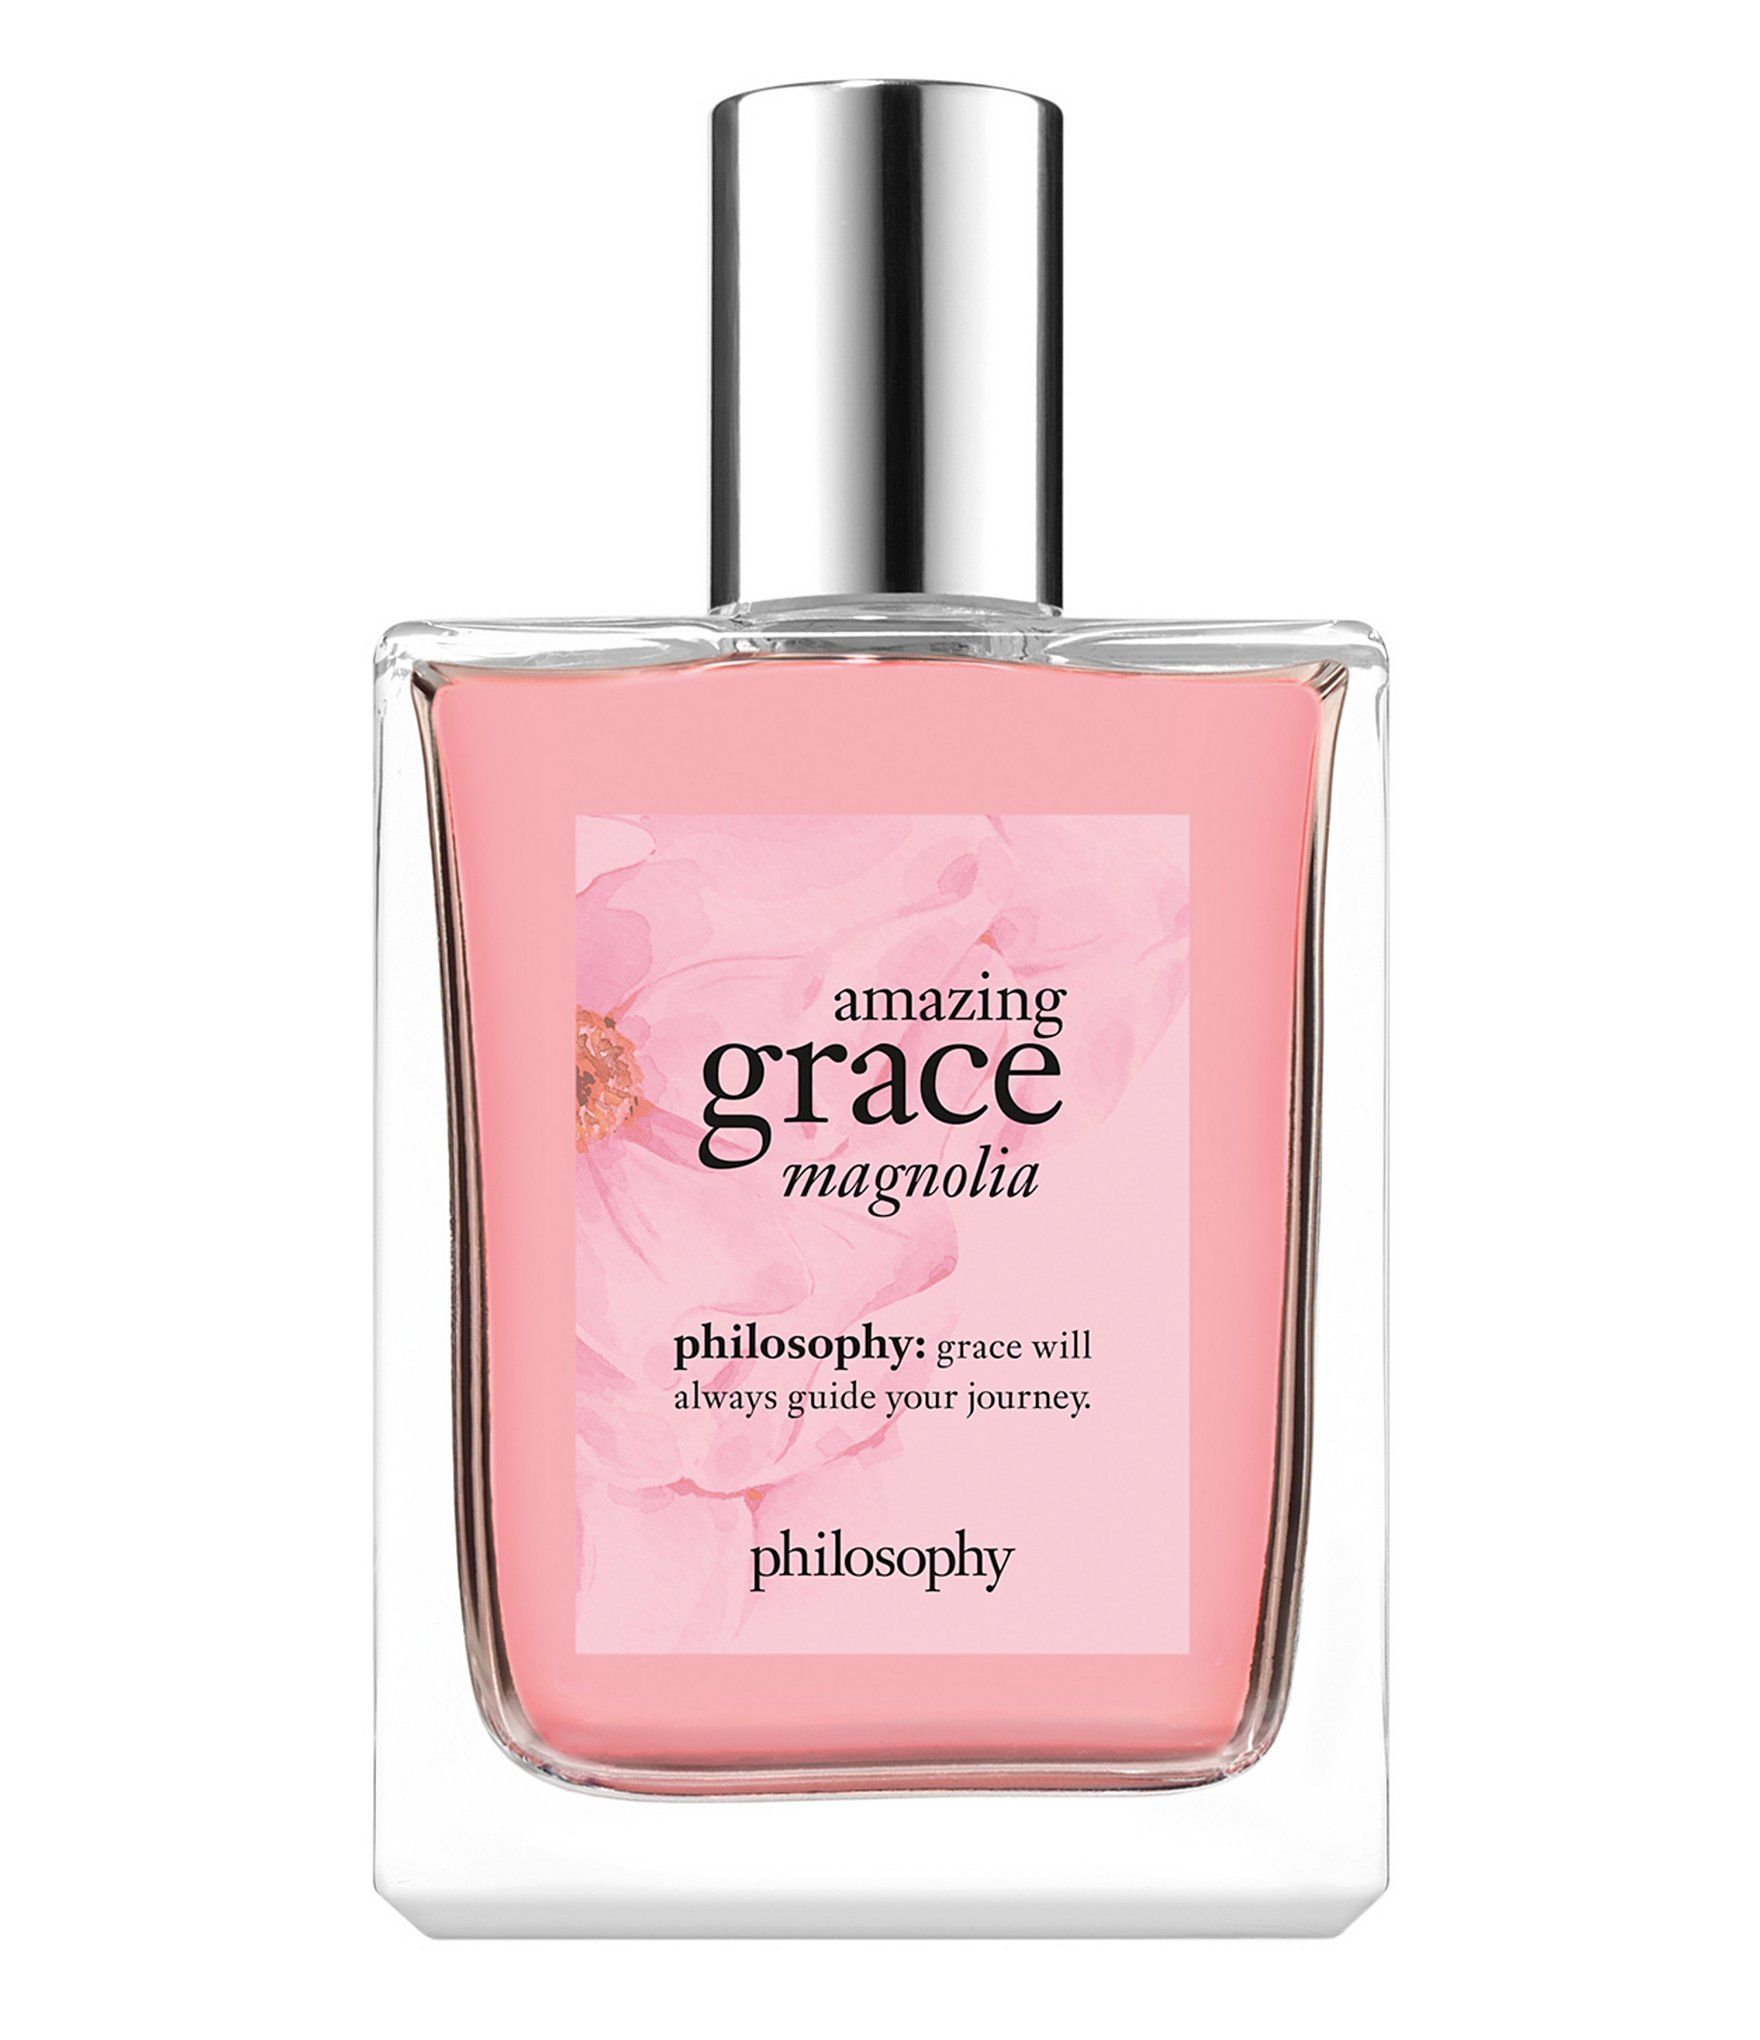 Philosophy Amazing Grace Magnolia Eau De Toilette Dillard S In 2021 Philosophy Amazing Grace Fragrance Spray Amazing Grace